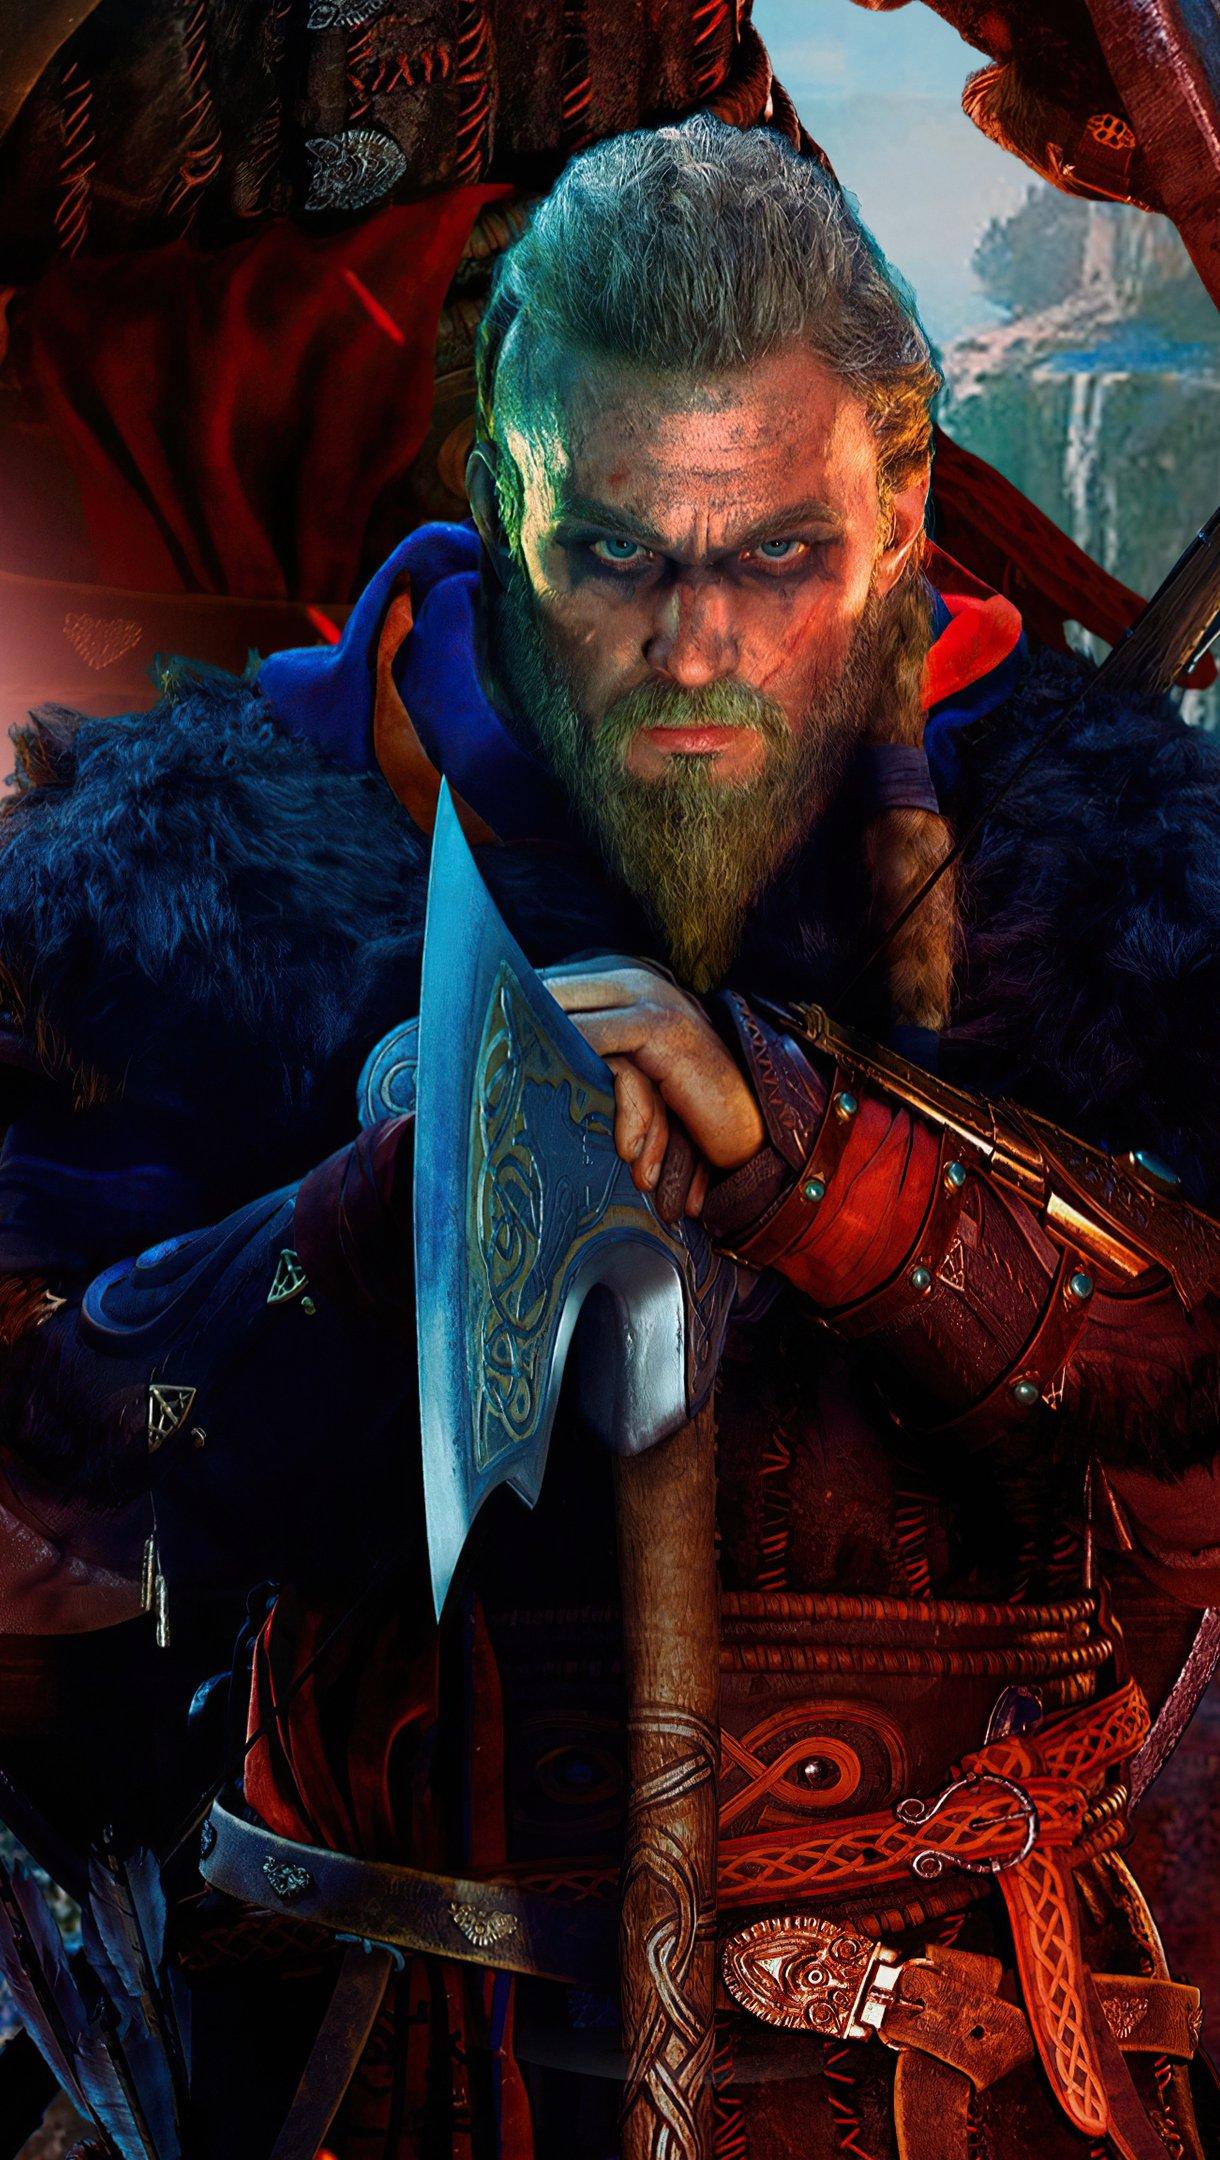 Wallpaper Assassins Creed Valhalla PS5 2021 Vertical